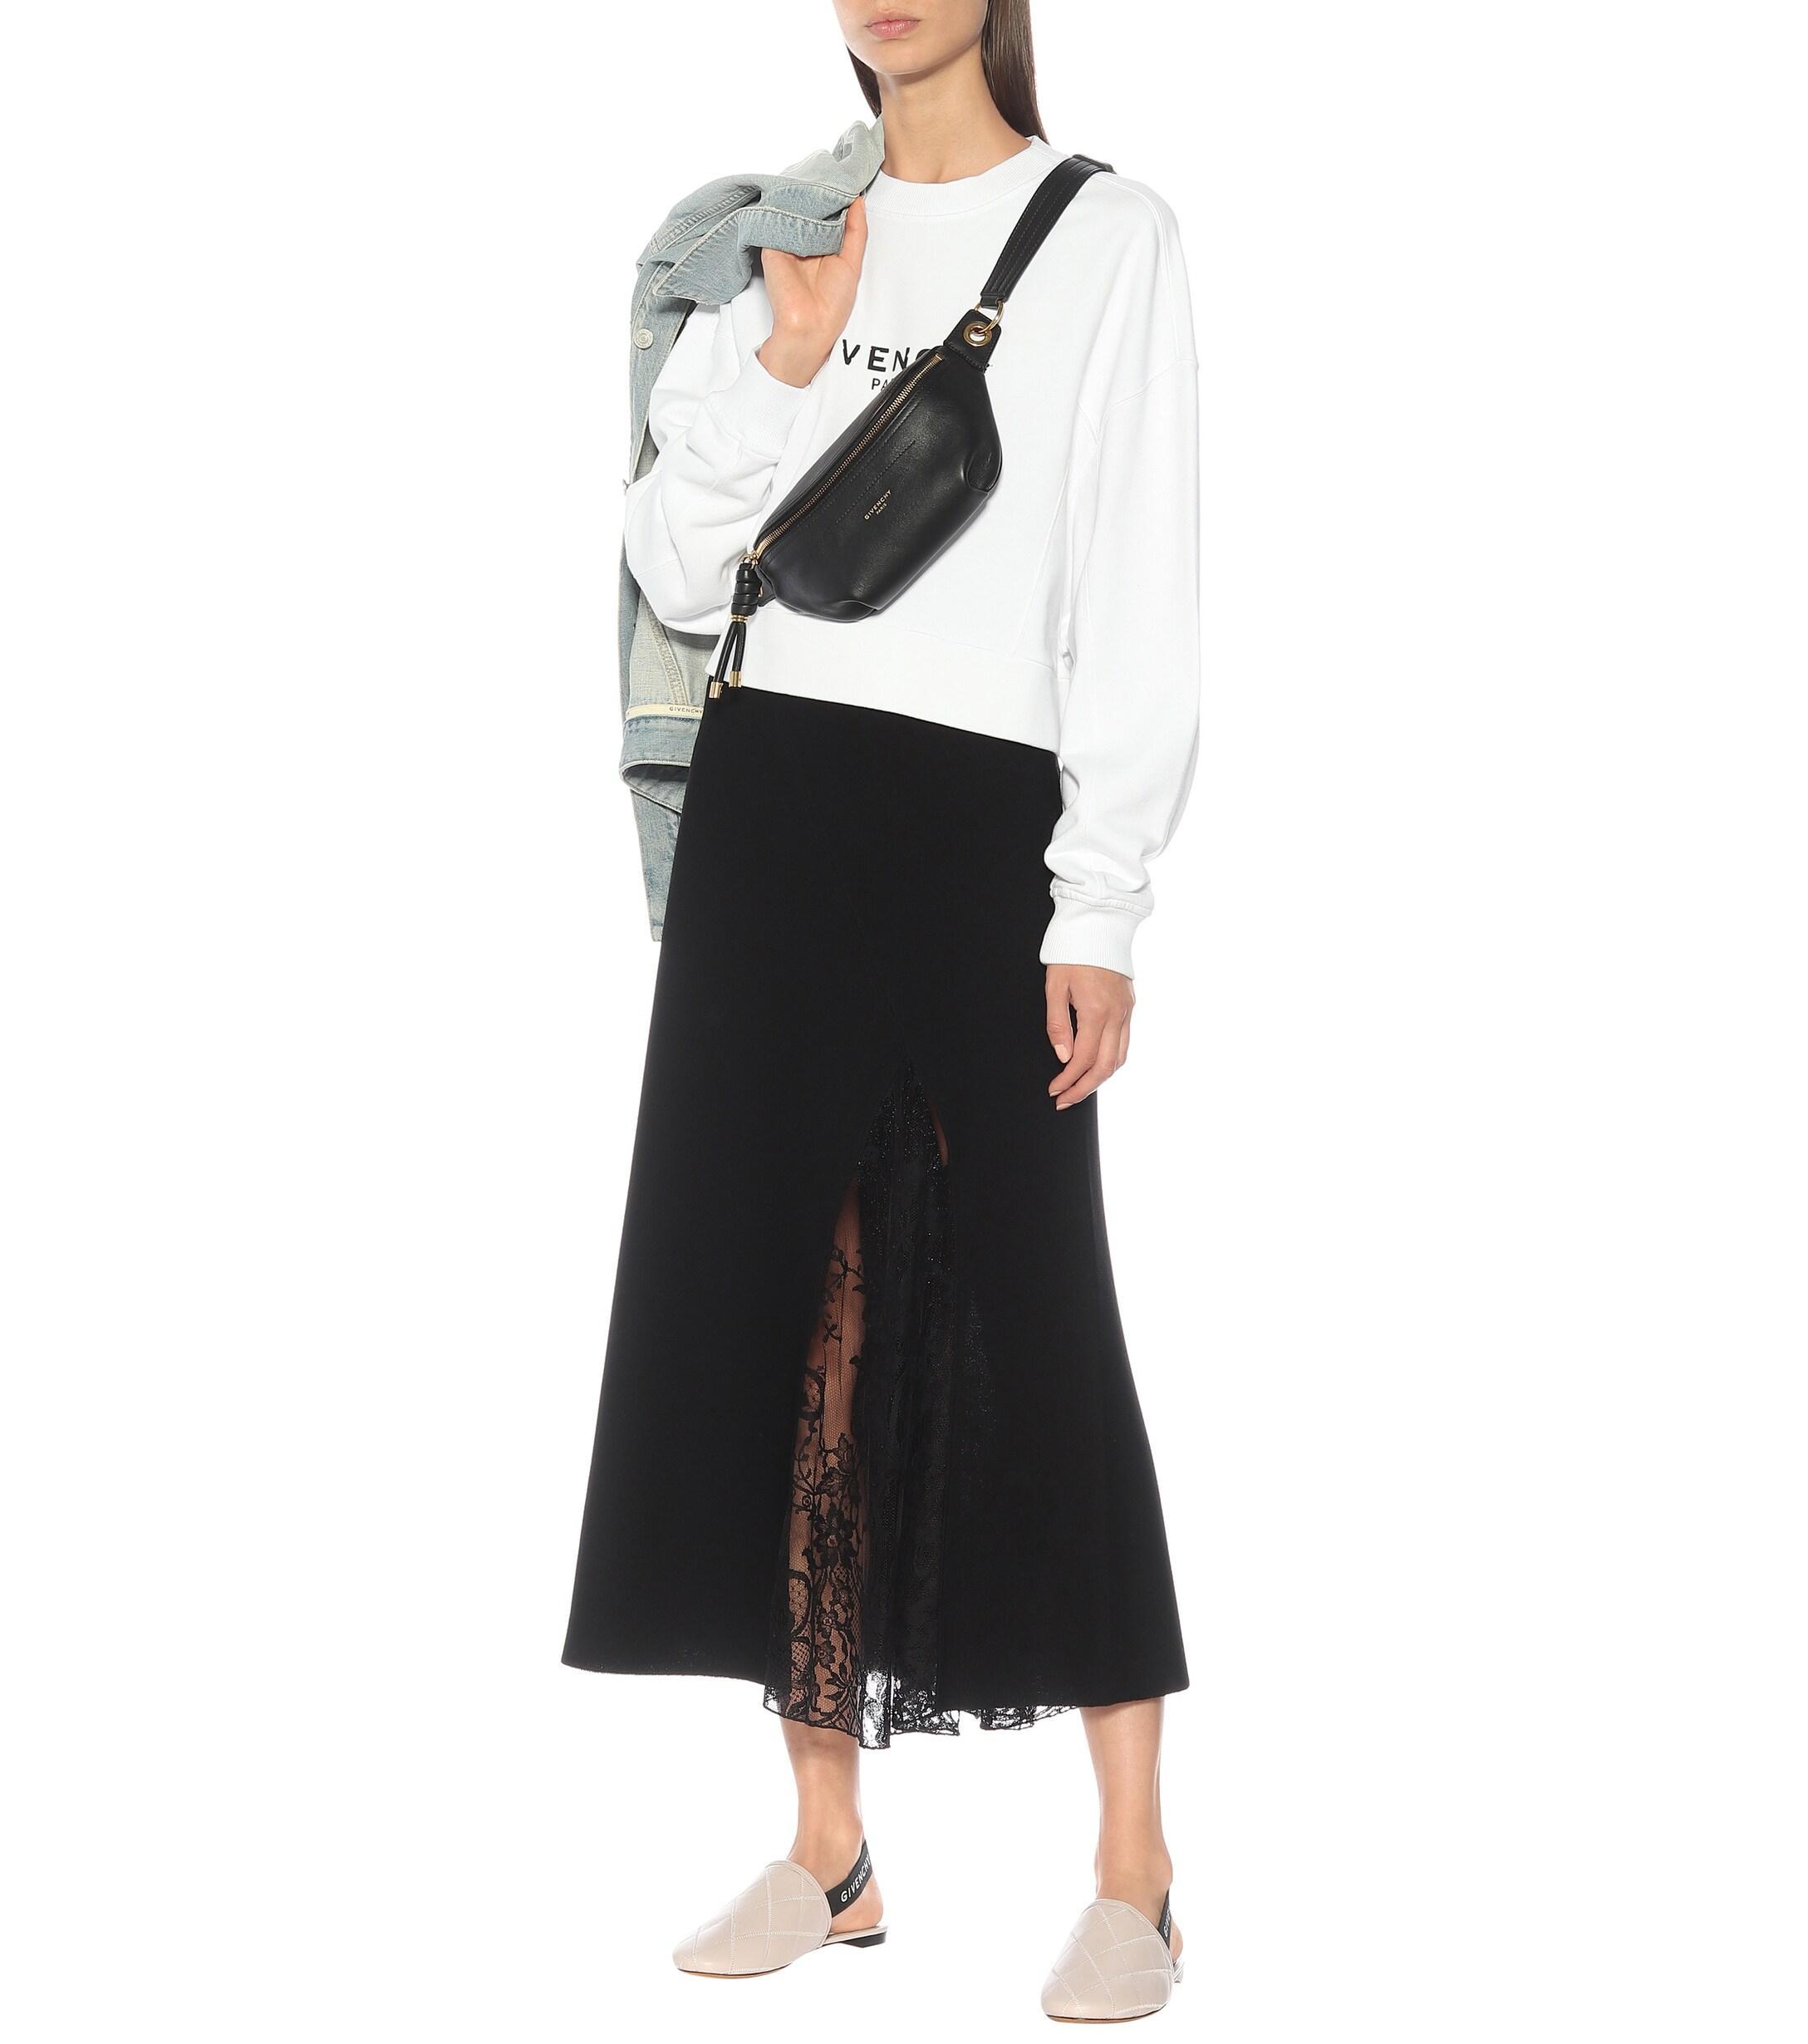 Givenchy Rivington Flat Leather